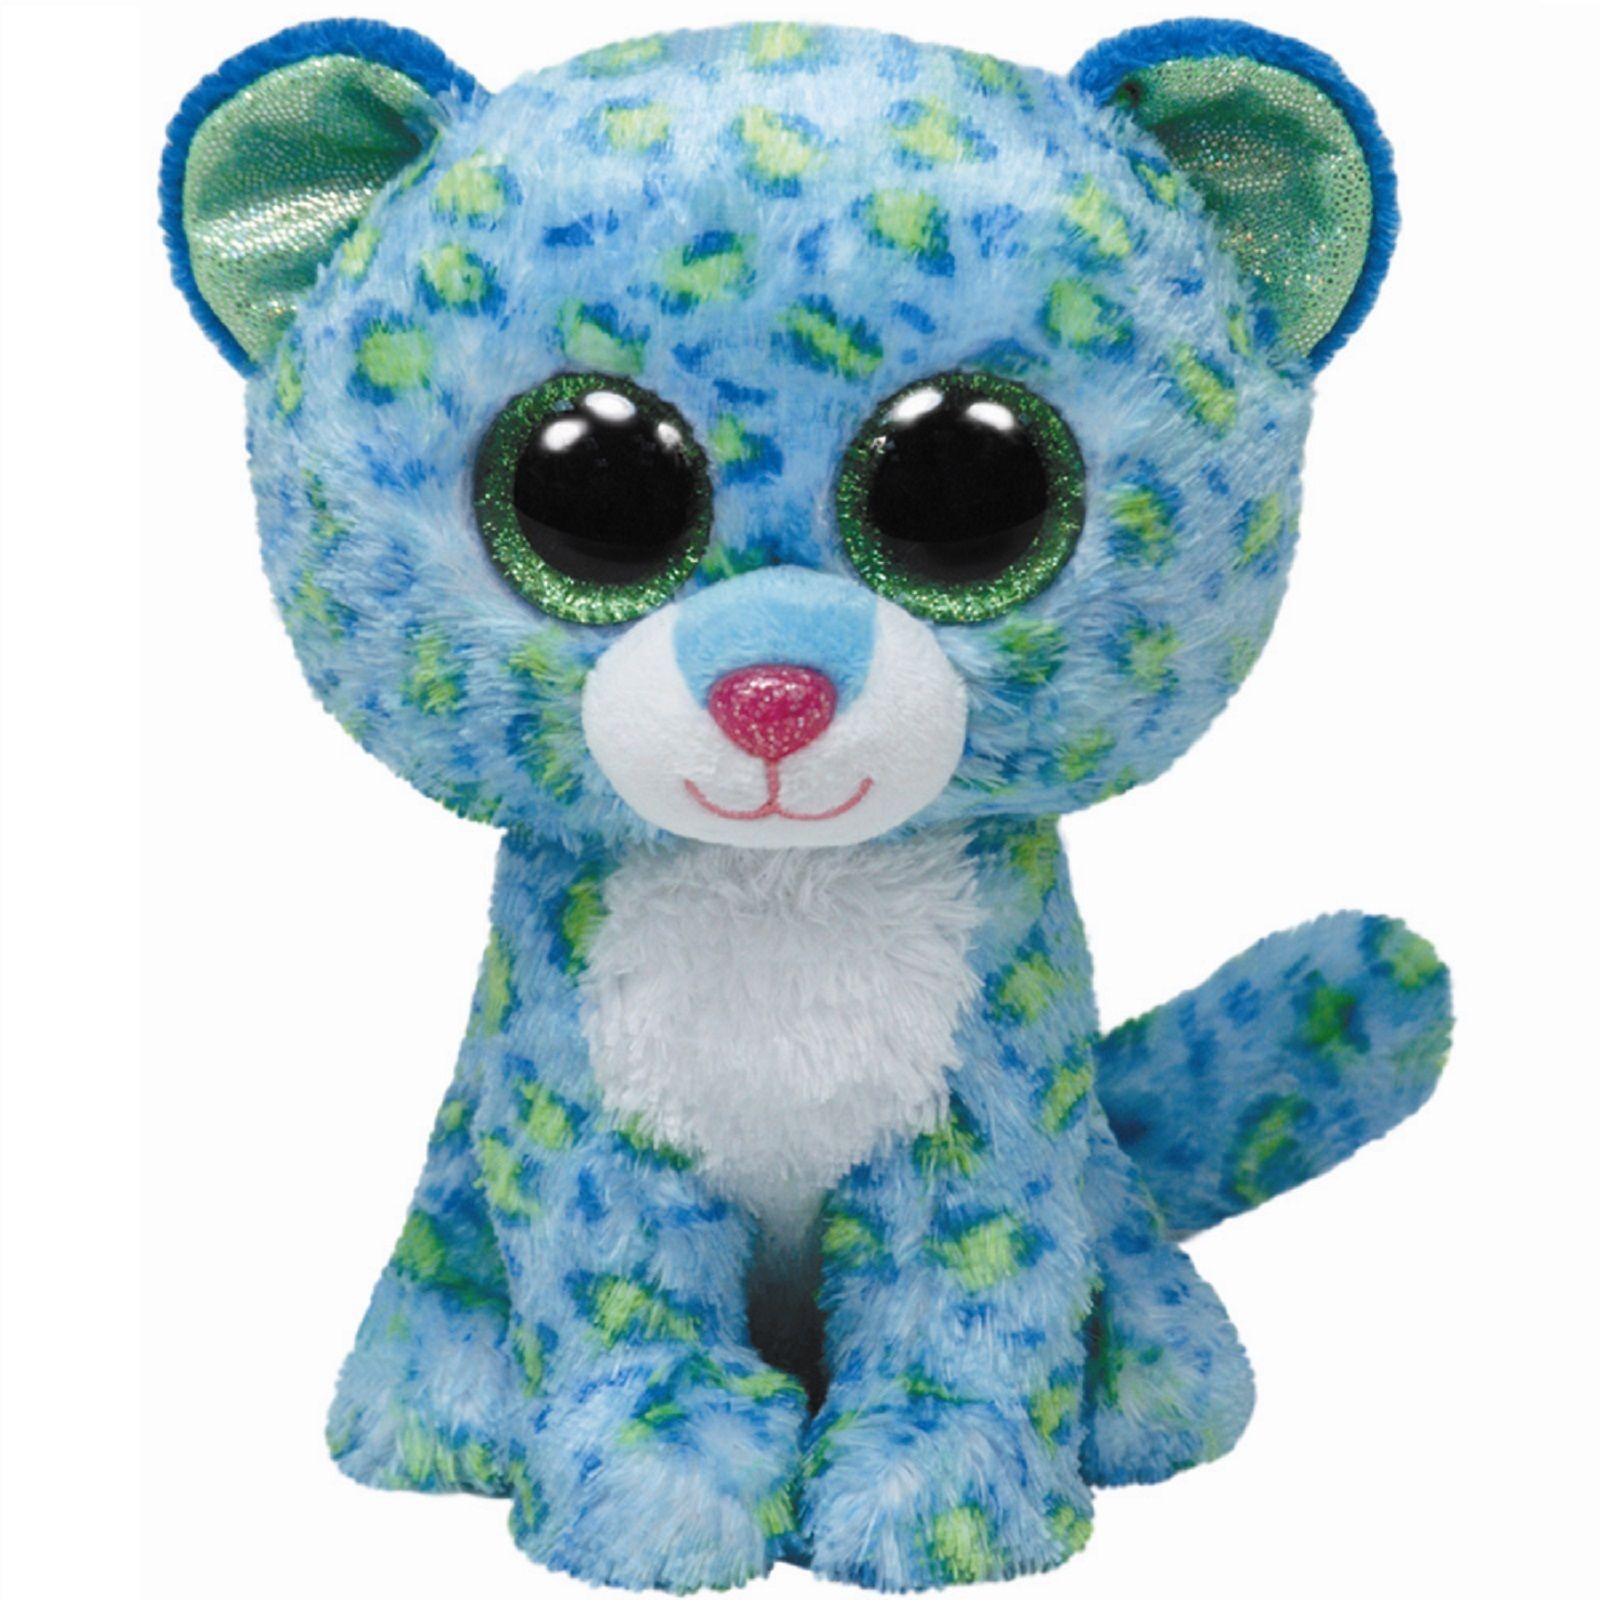 TY - Beanie Boo's Glubschi's - Neuheiten - 15cm - große Auswahl - Neuware | eBay